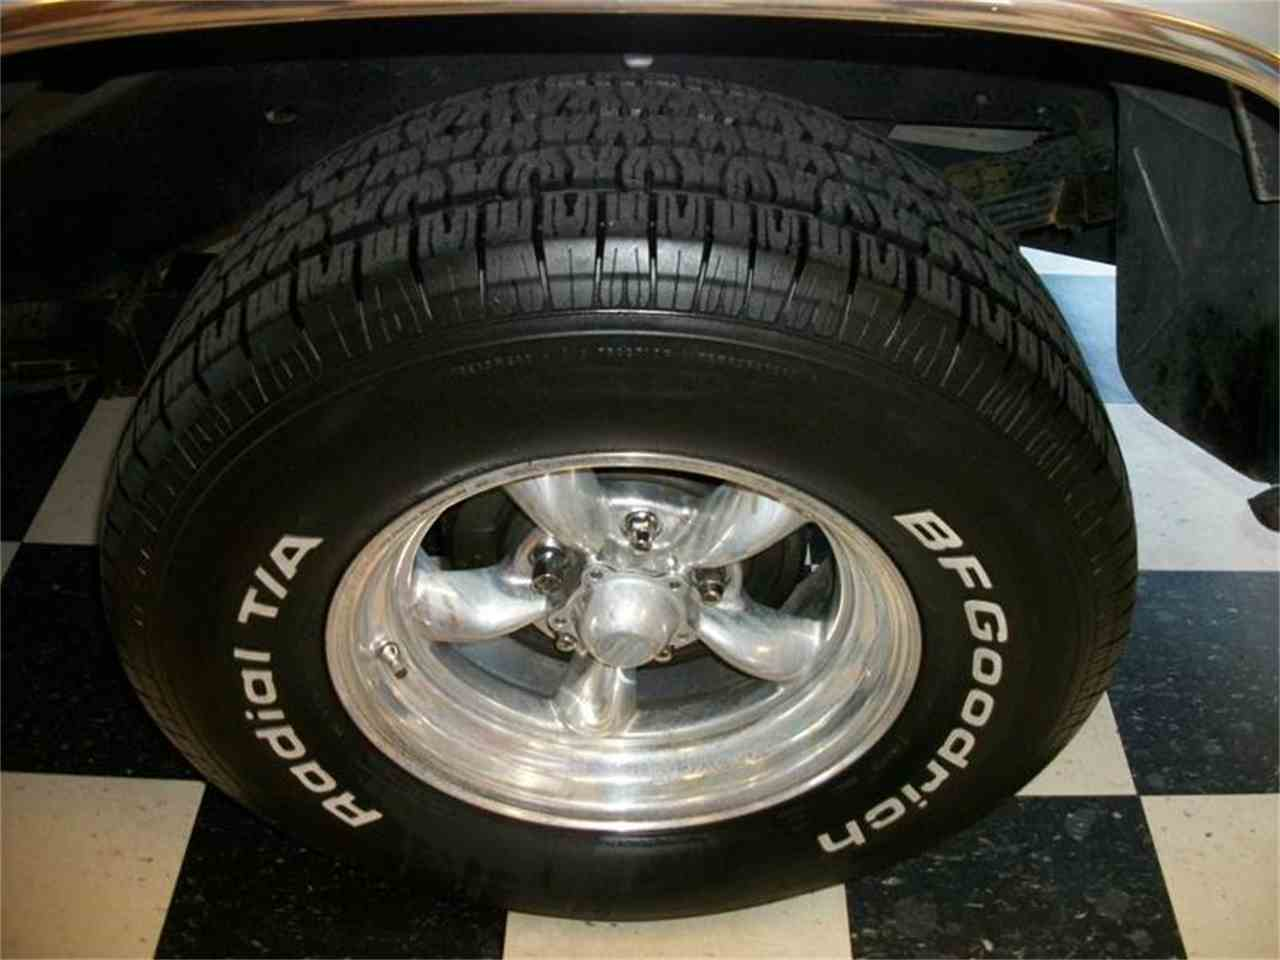 1997 Chevrolet Tahoe for Sale | ClassicCars.com | CC-1028769